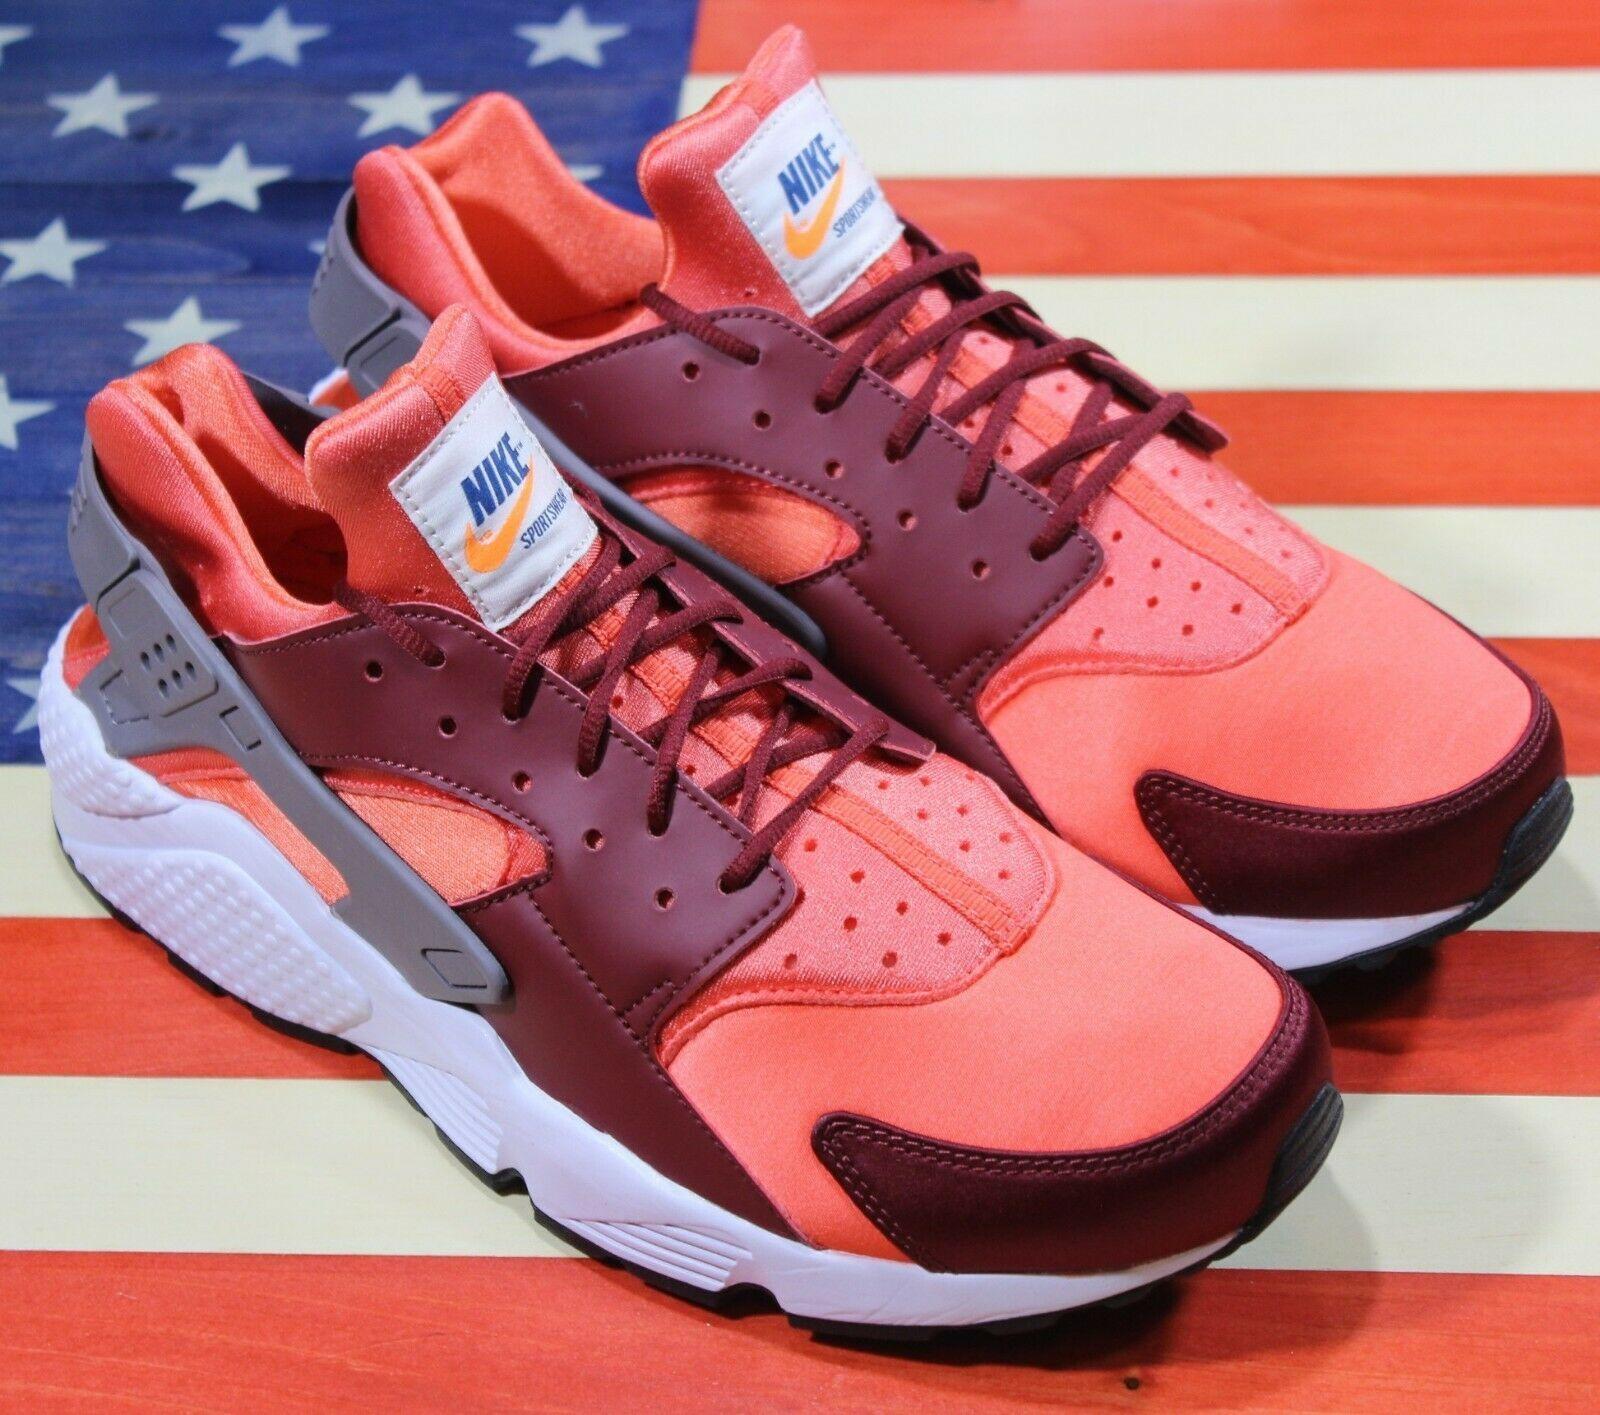 Nike Air Huarache Run Running Shoes Team Red Coral White [318429-054] Men's 11.5 image 10